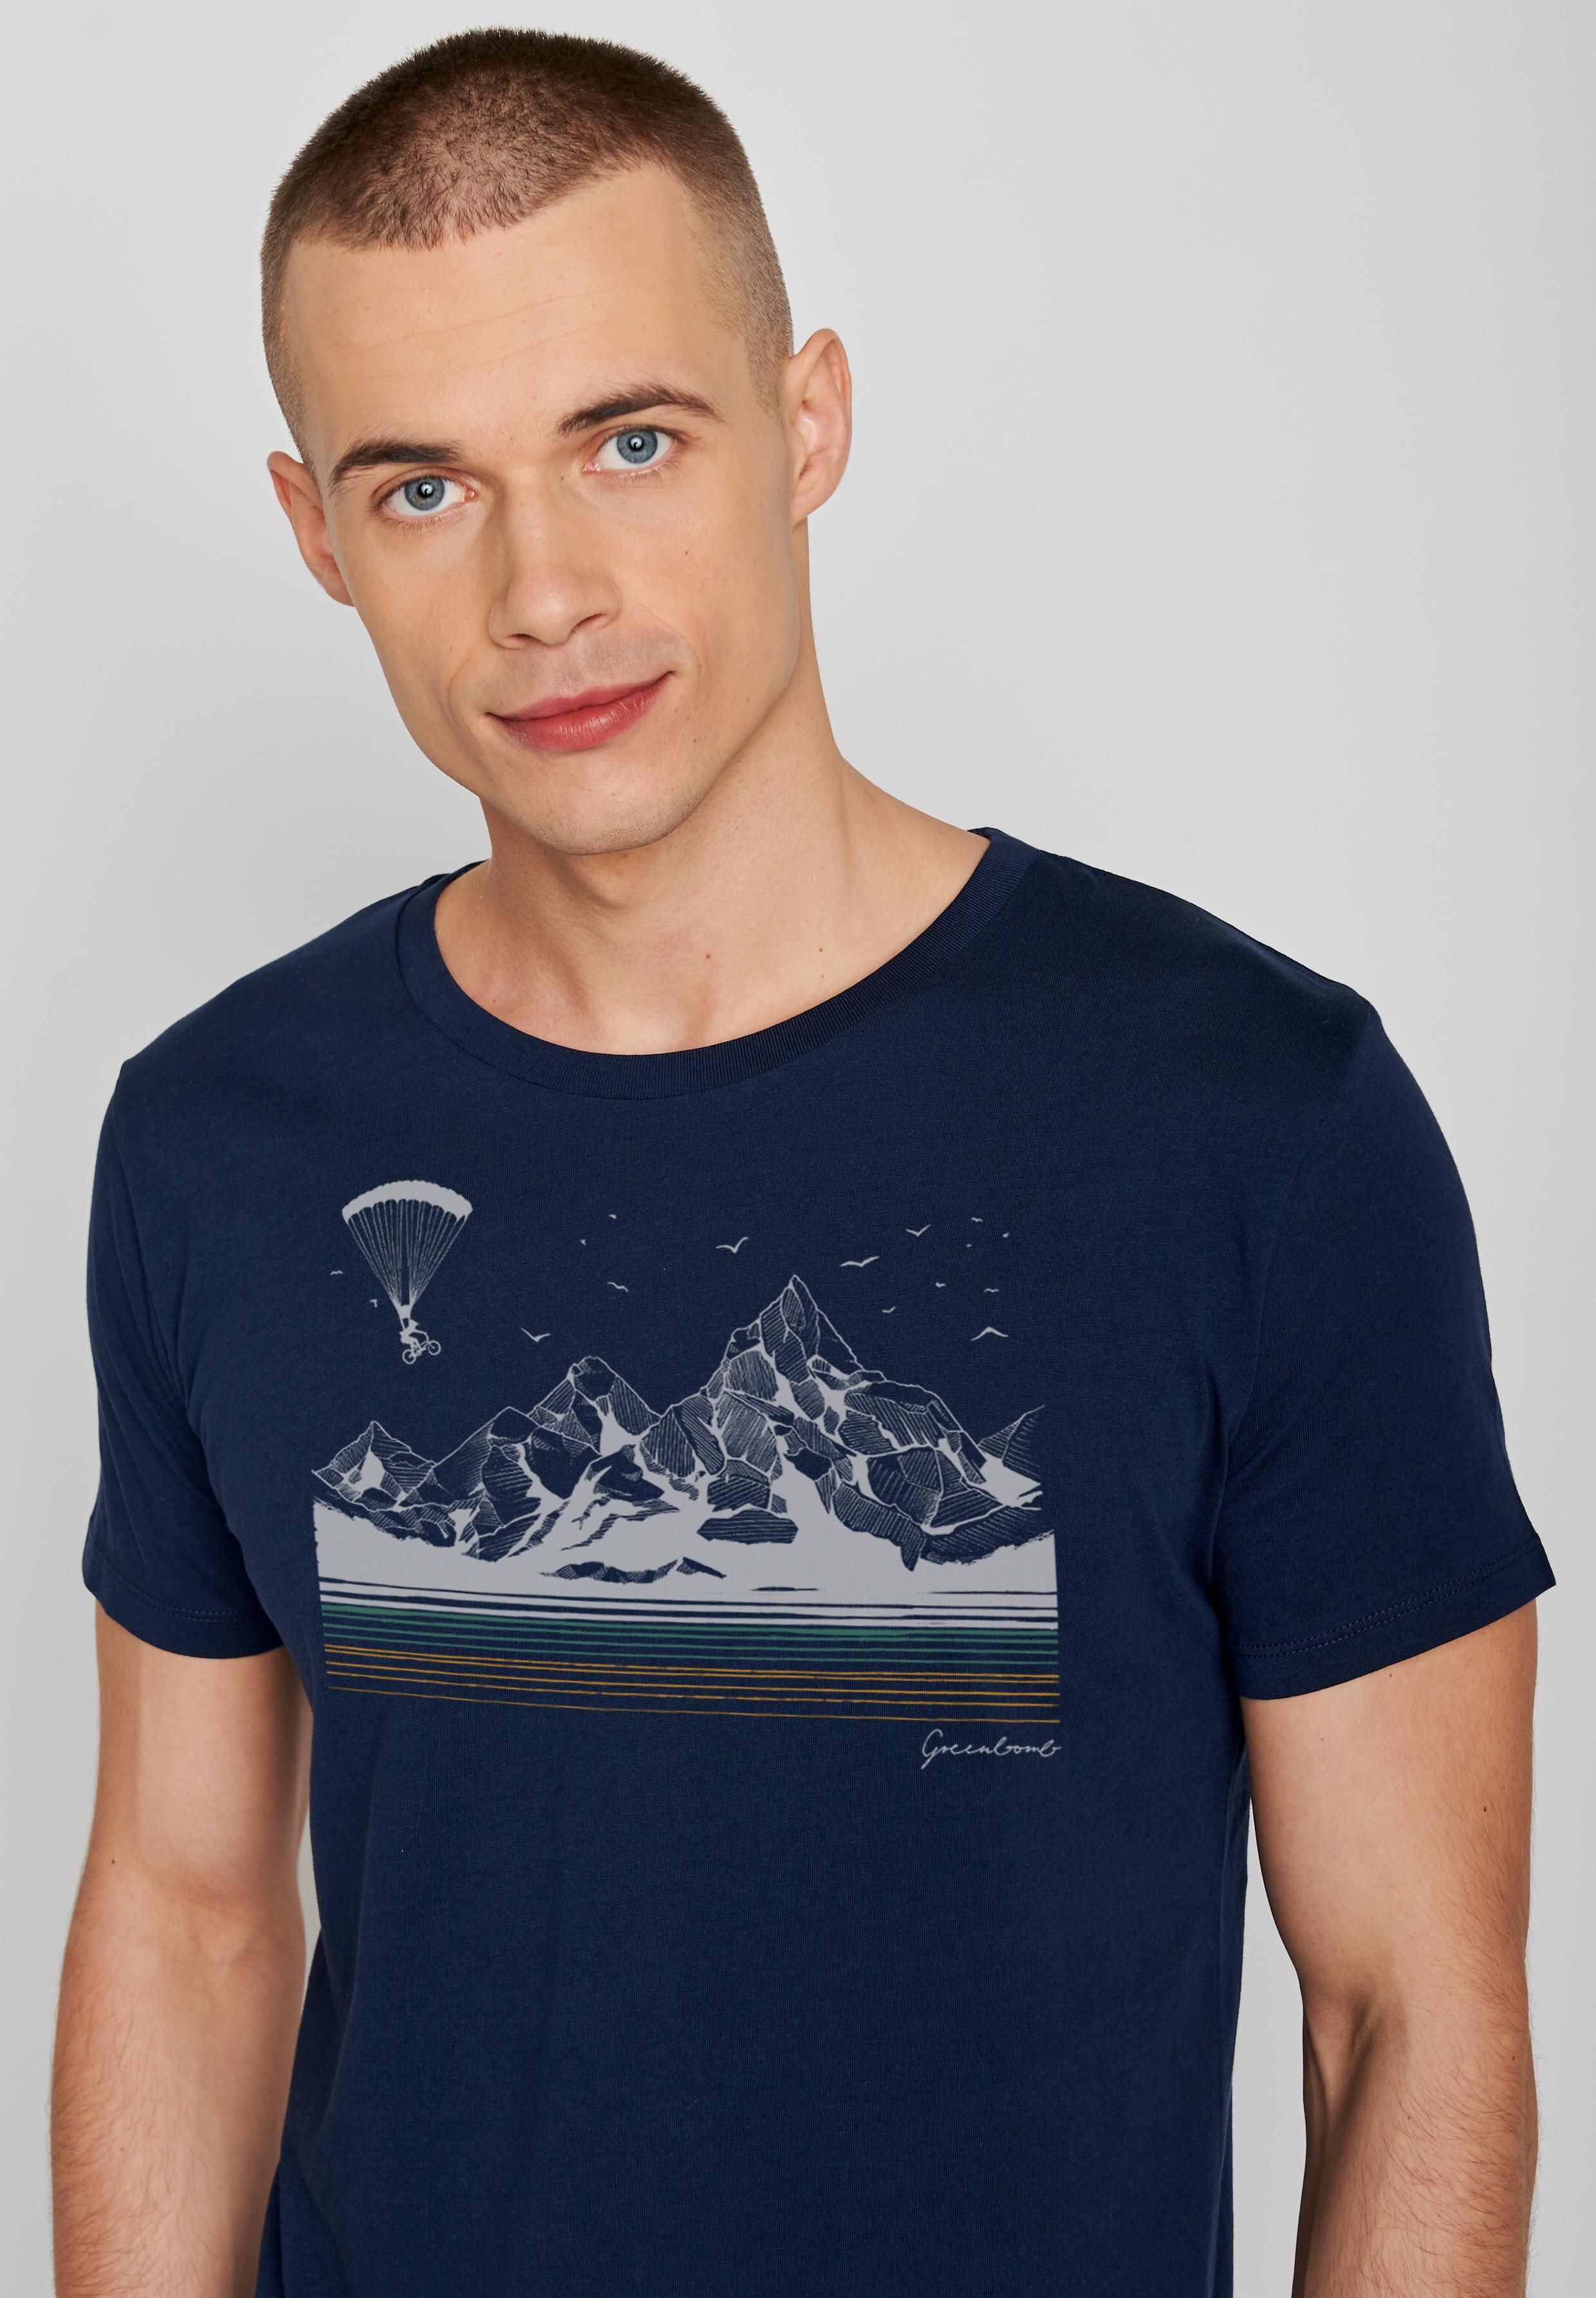 GREENBOMB-BIKE-FLY-Guide-T-Shirt-heather-black_detail